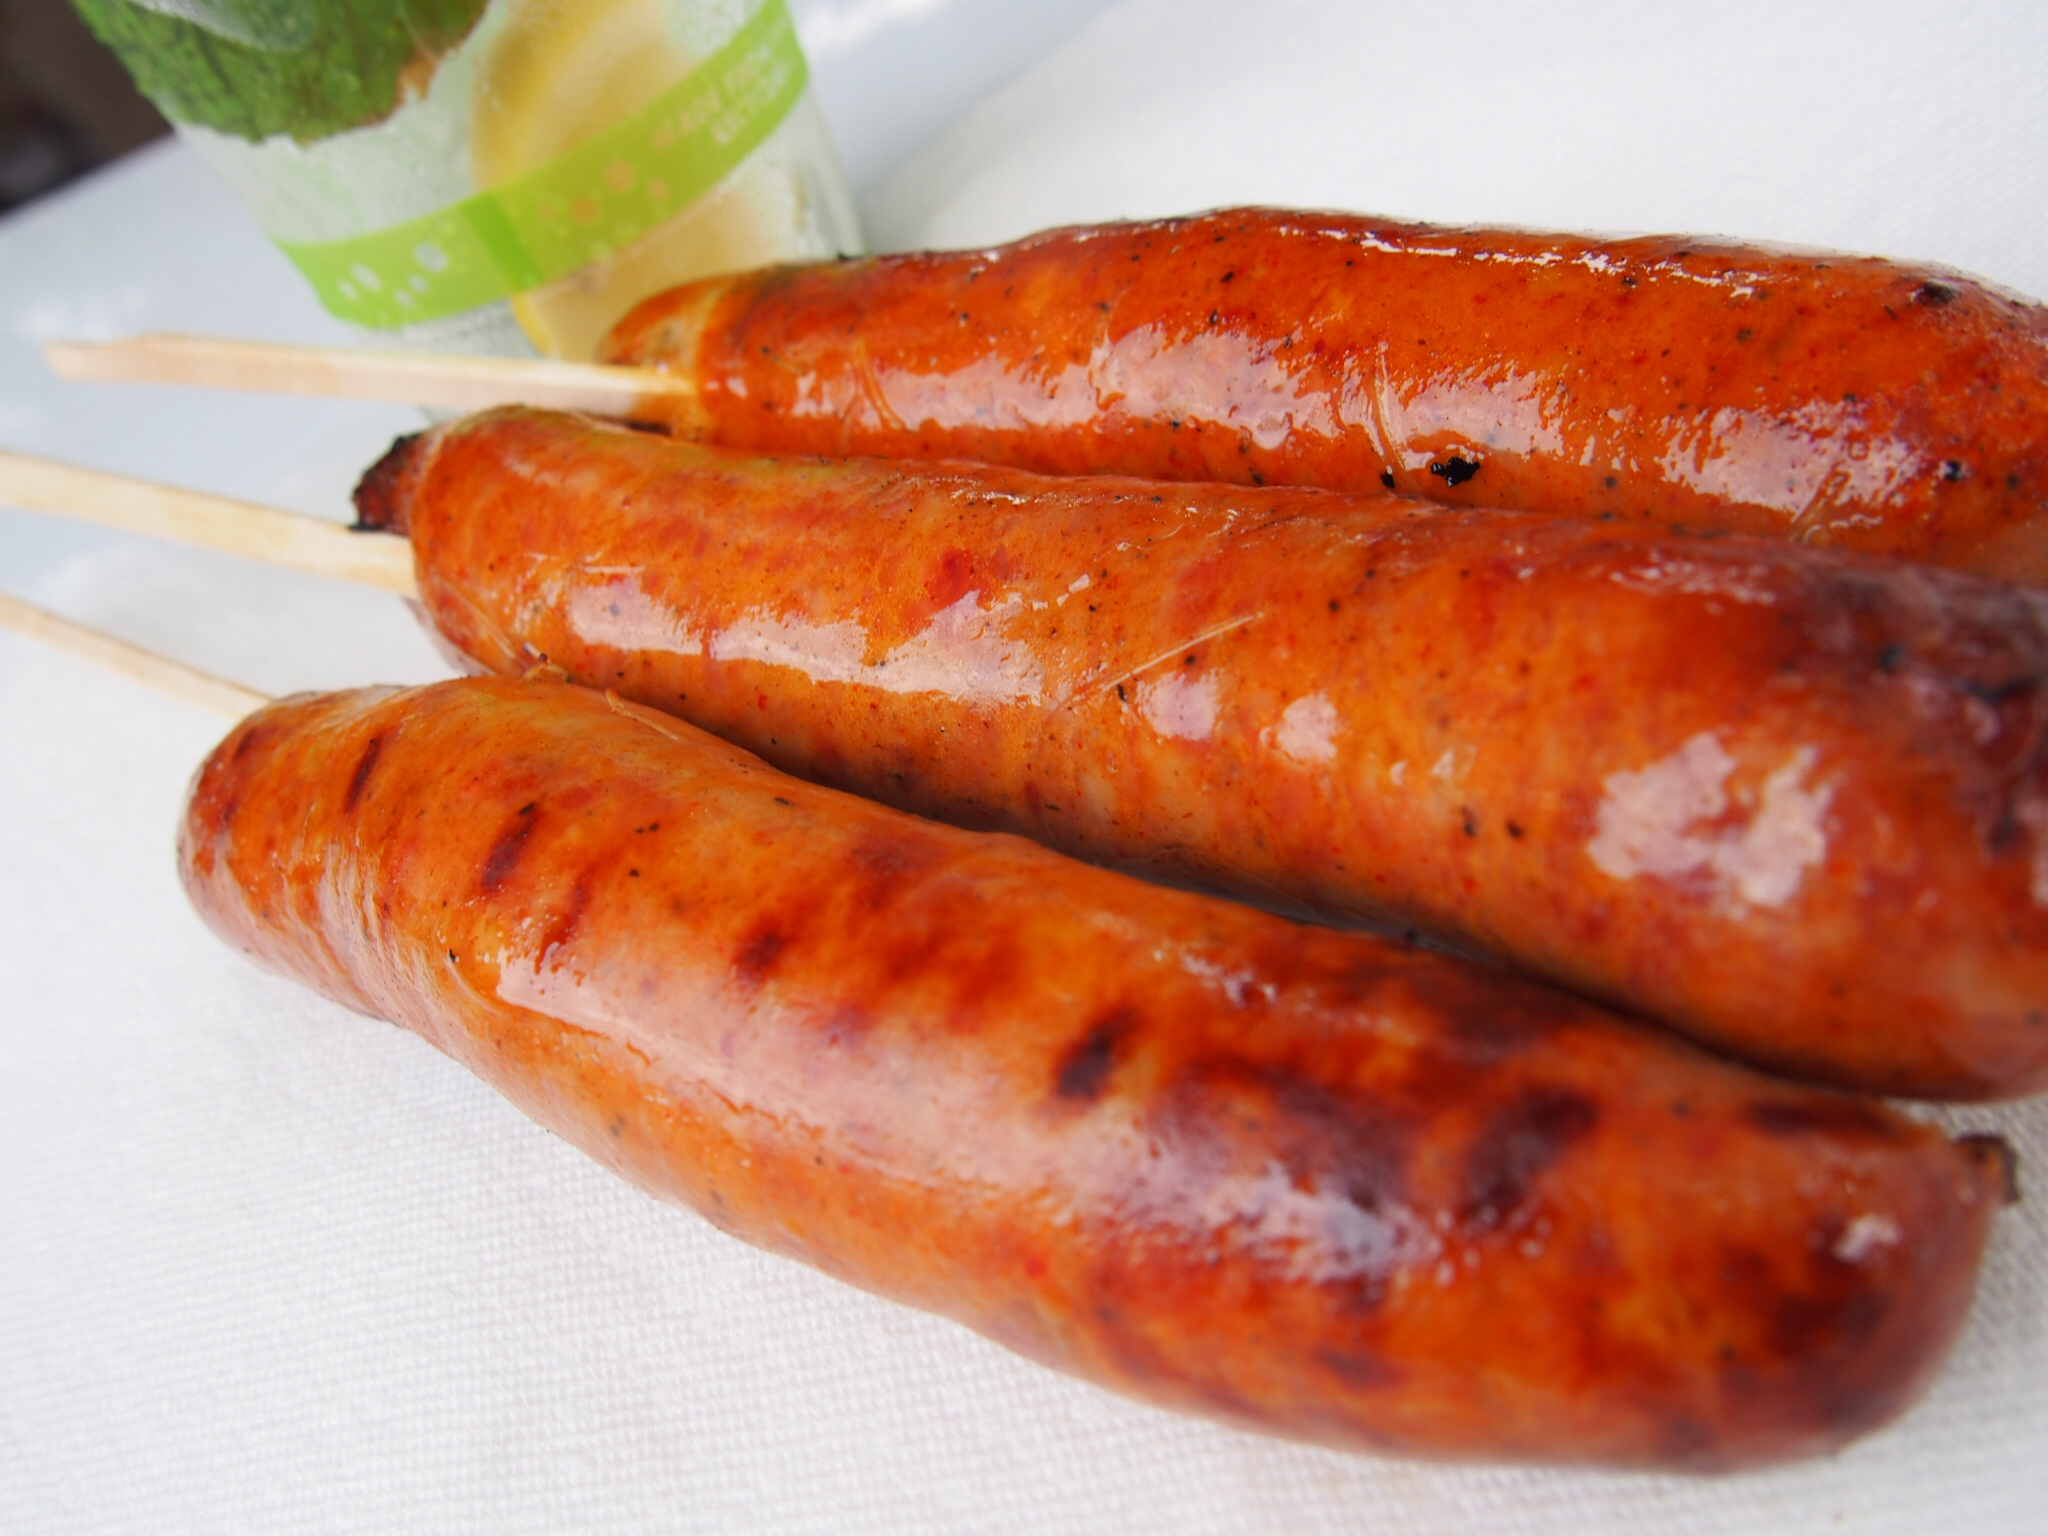 Portguese Sausage